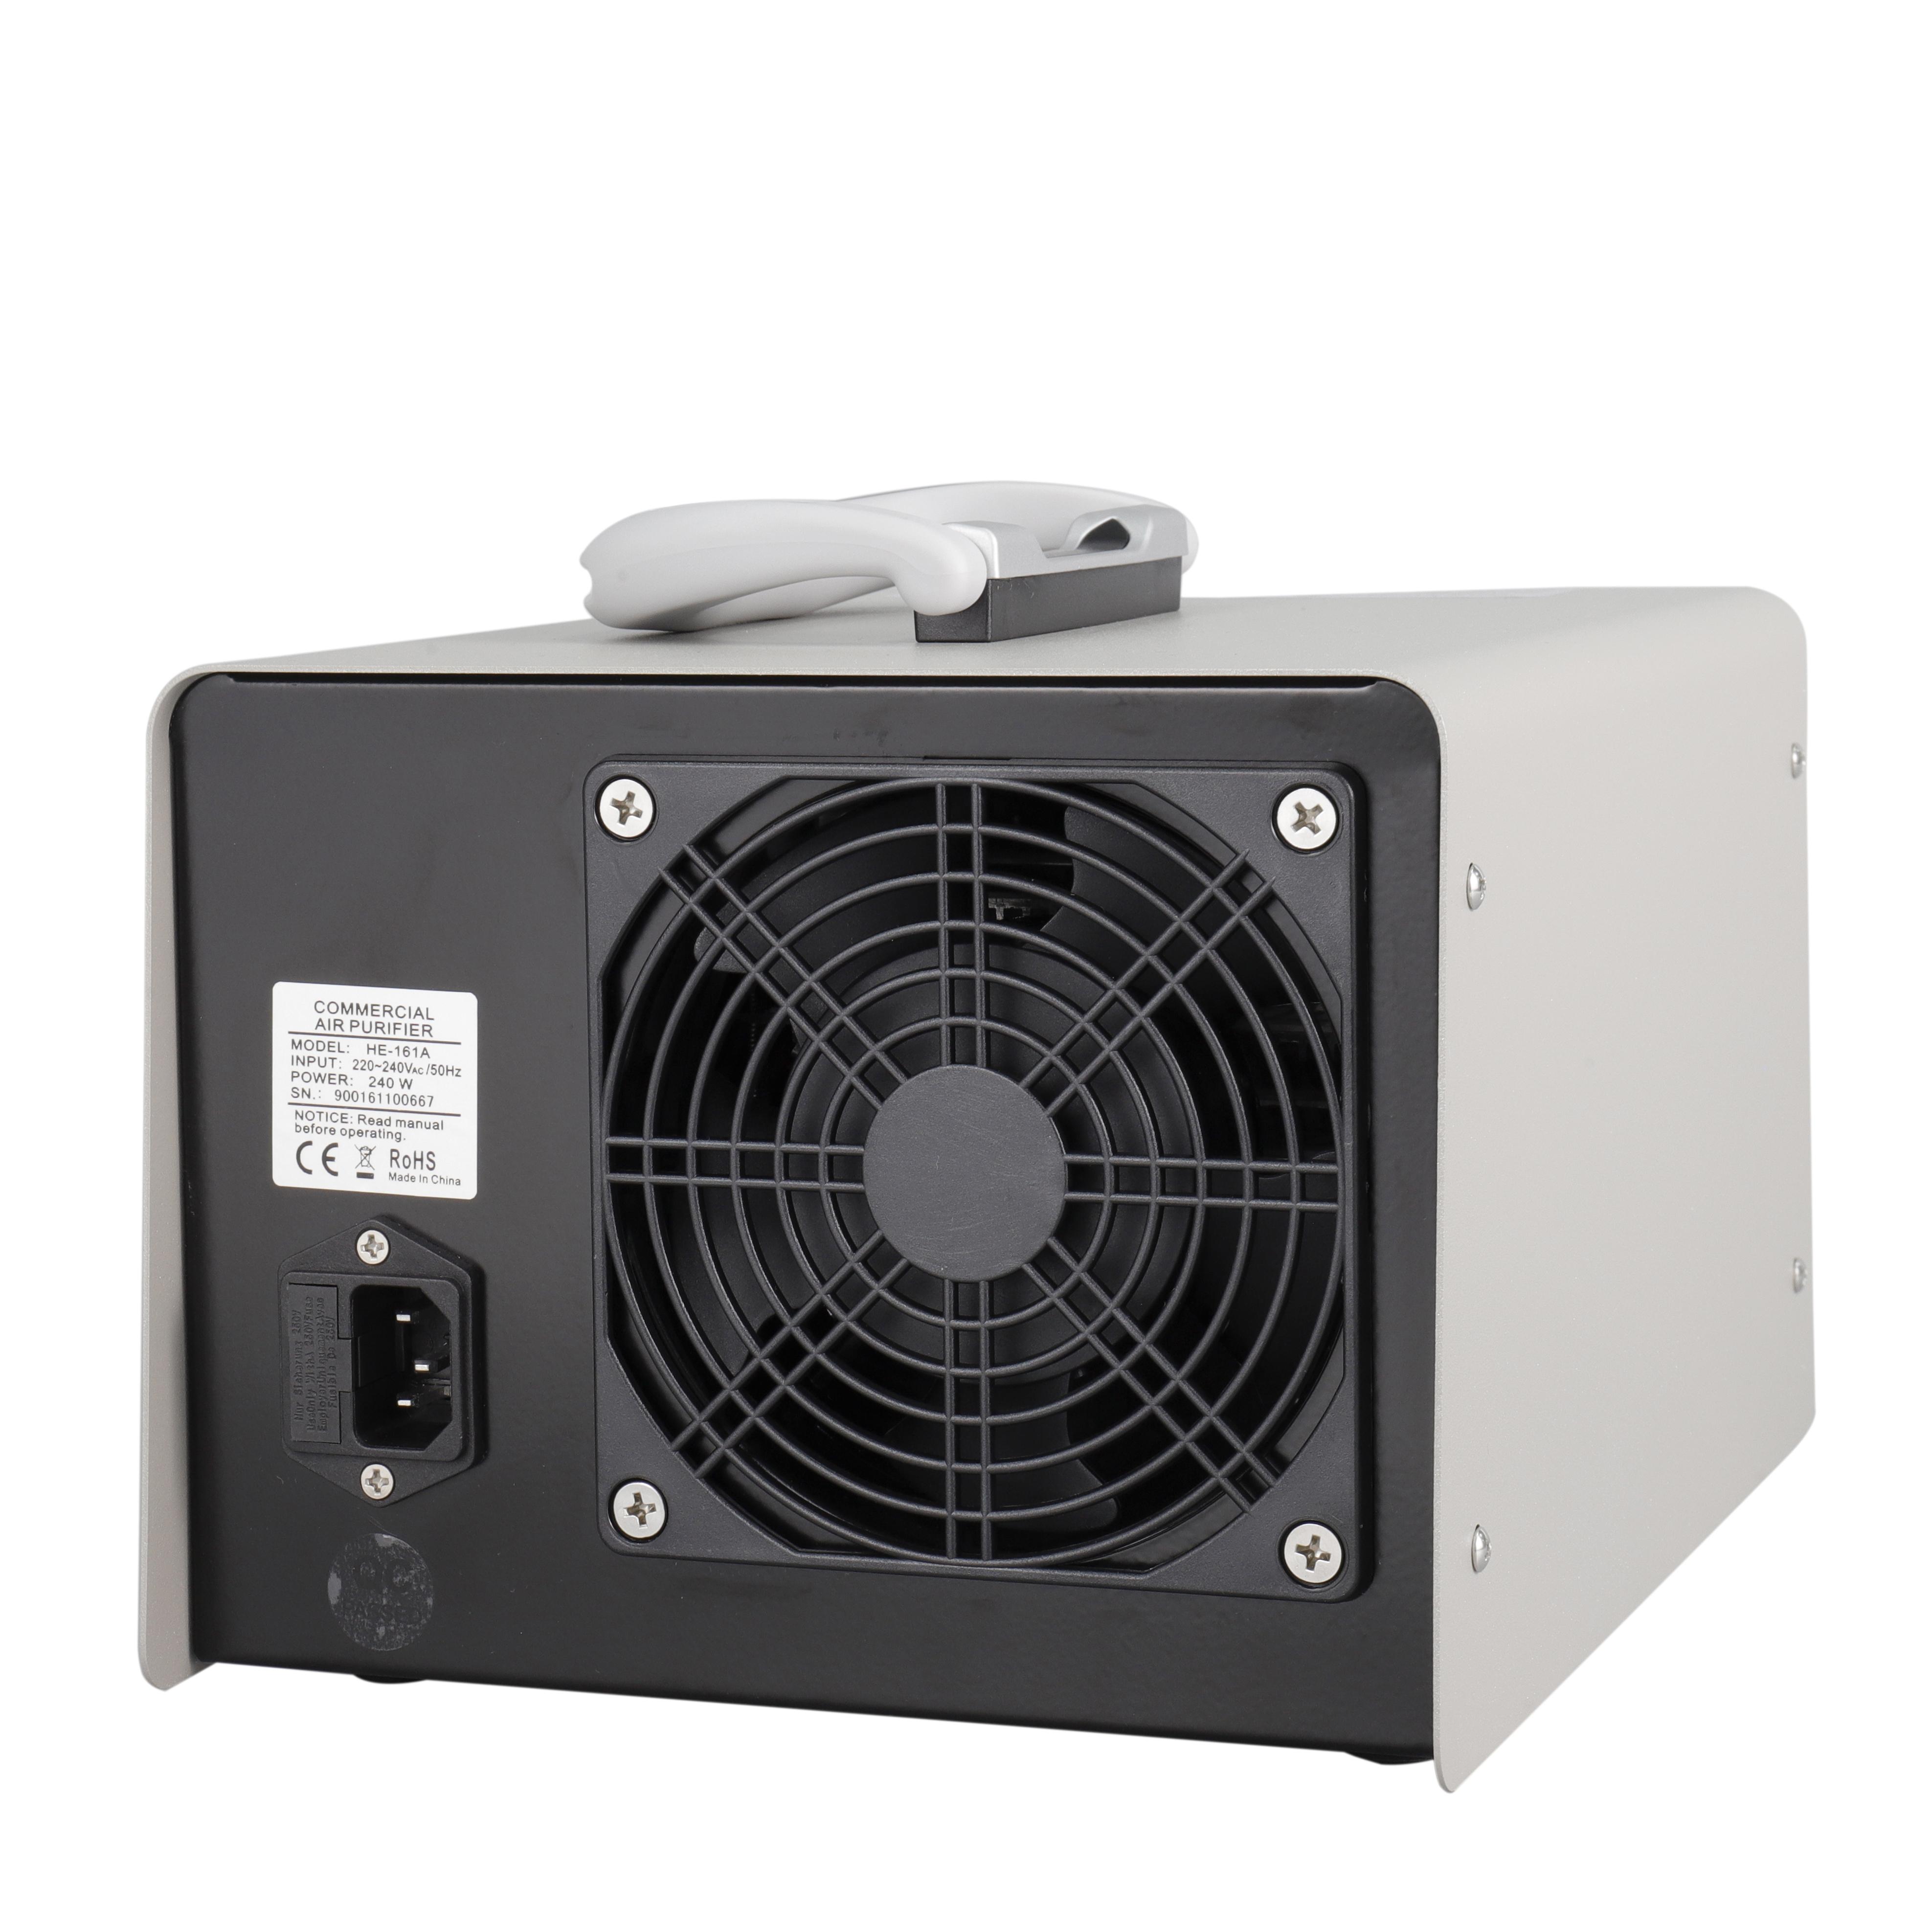 30000mg//h Ozone Generator Air Purifier Sterilizer For Farm Ozone Maker USA Stock